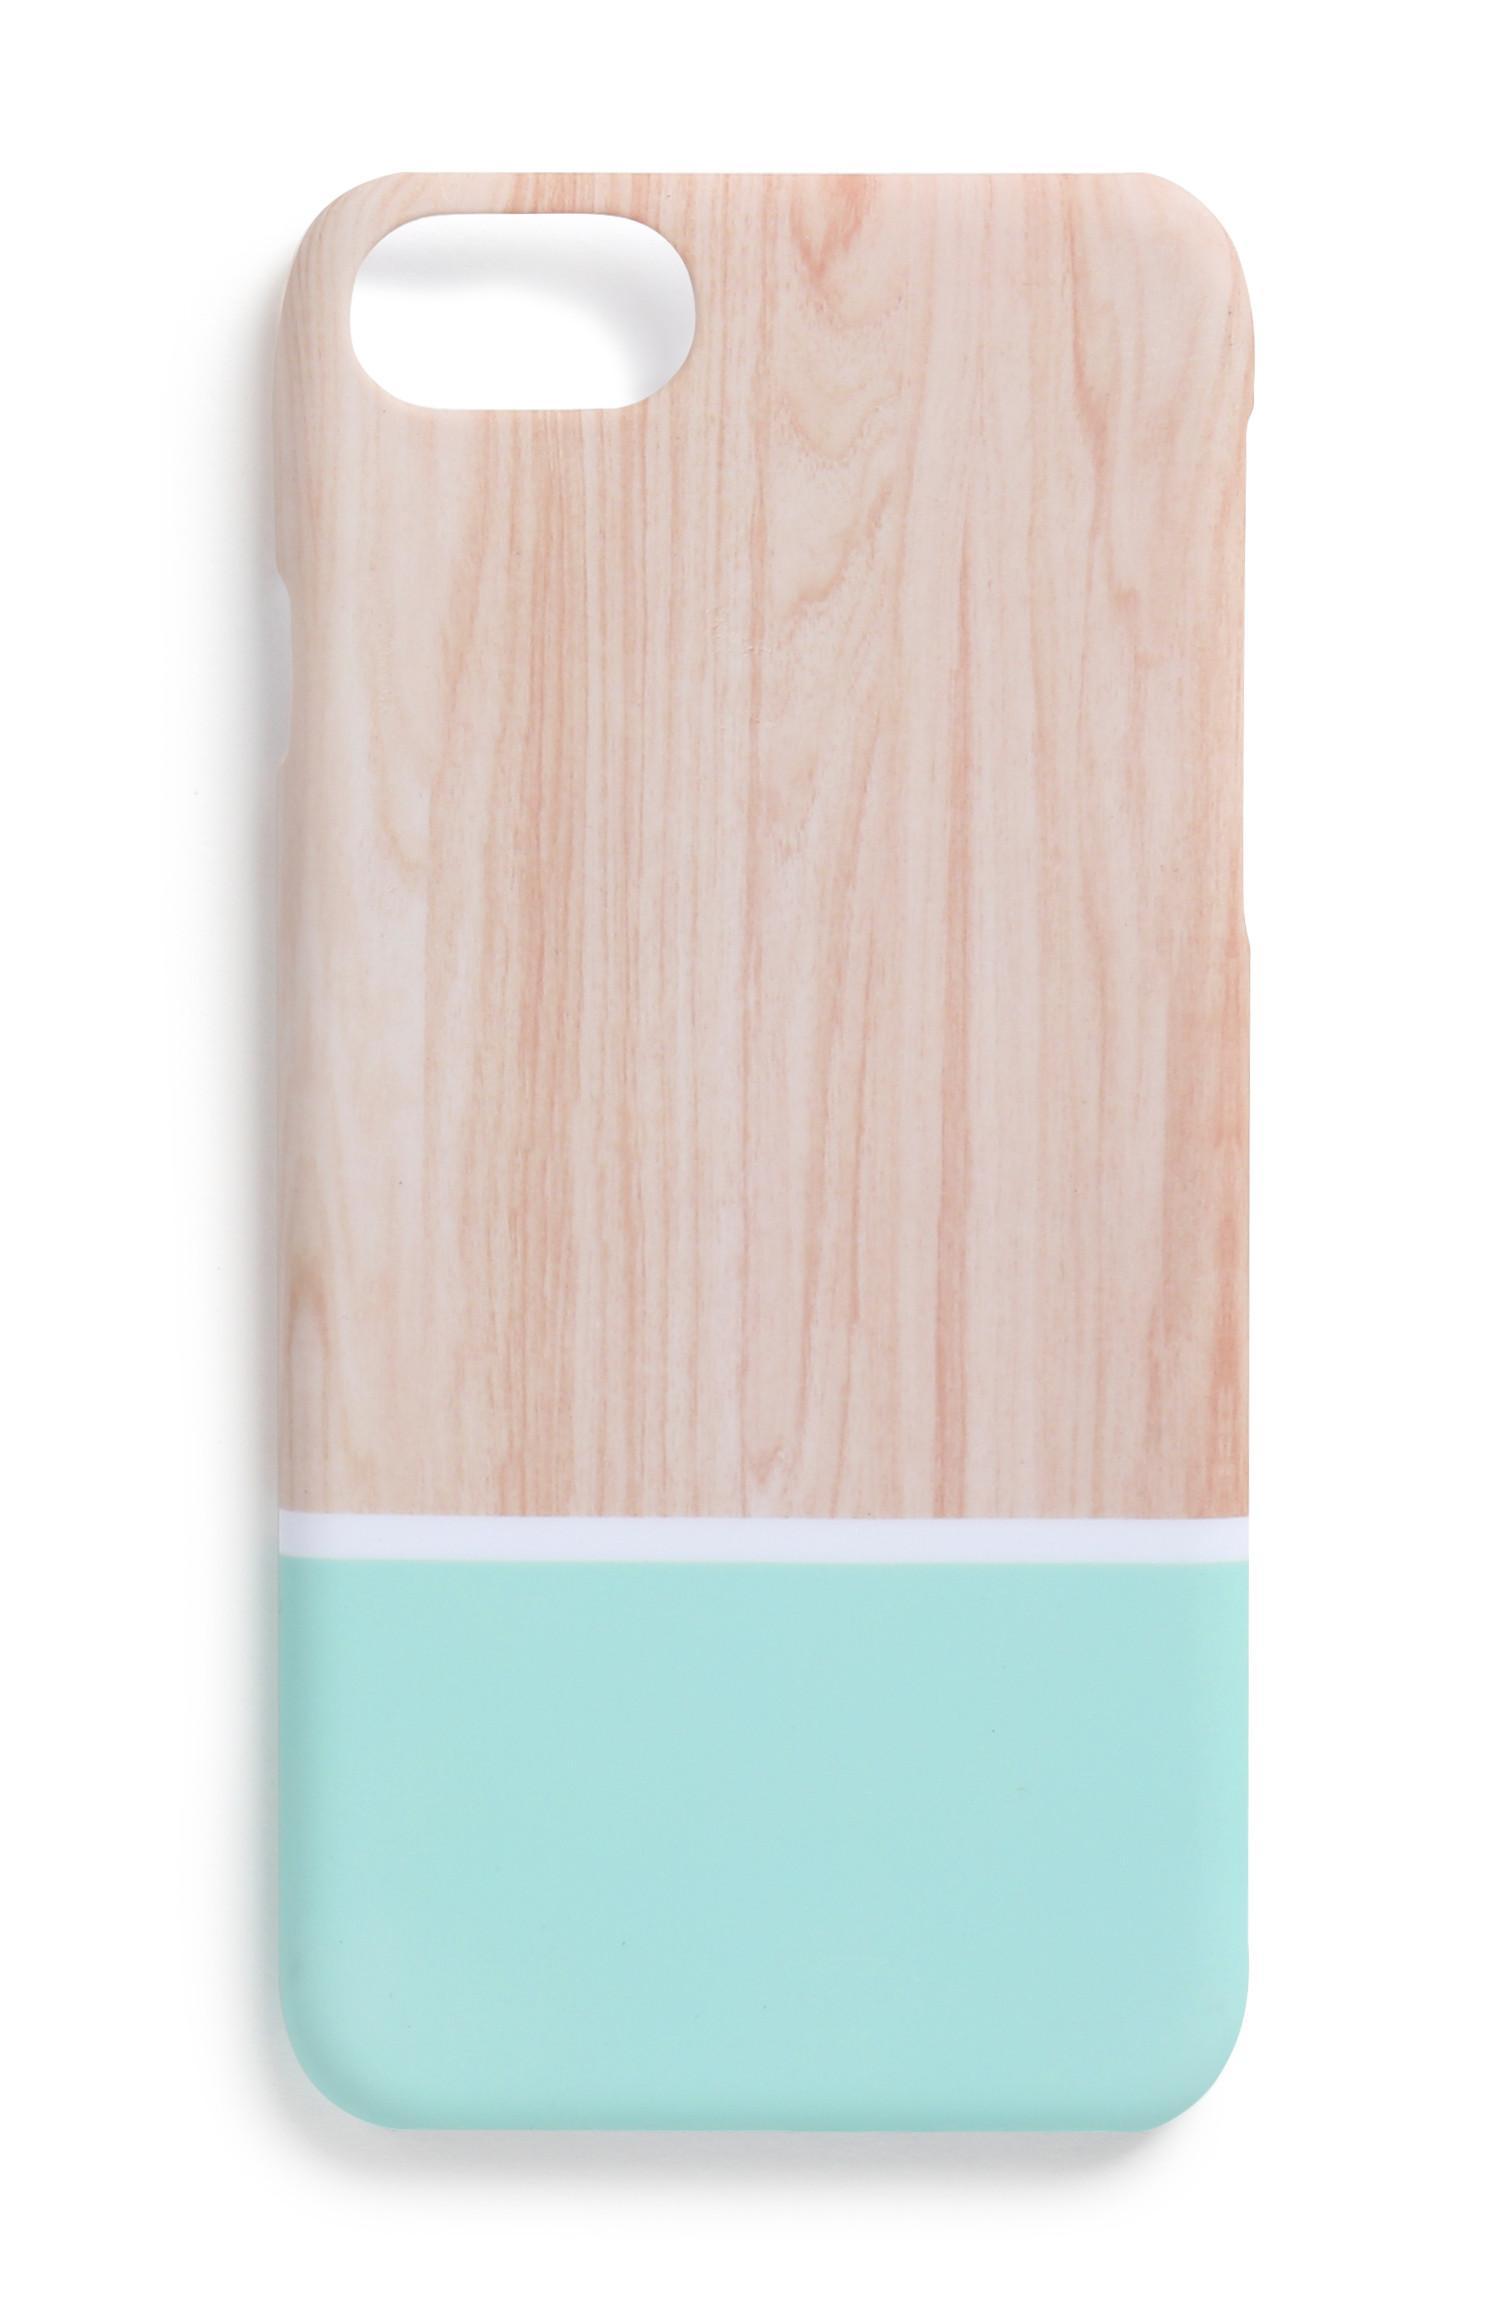 Handyhülle aus Holz